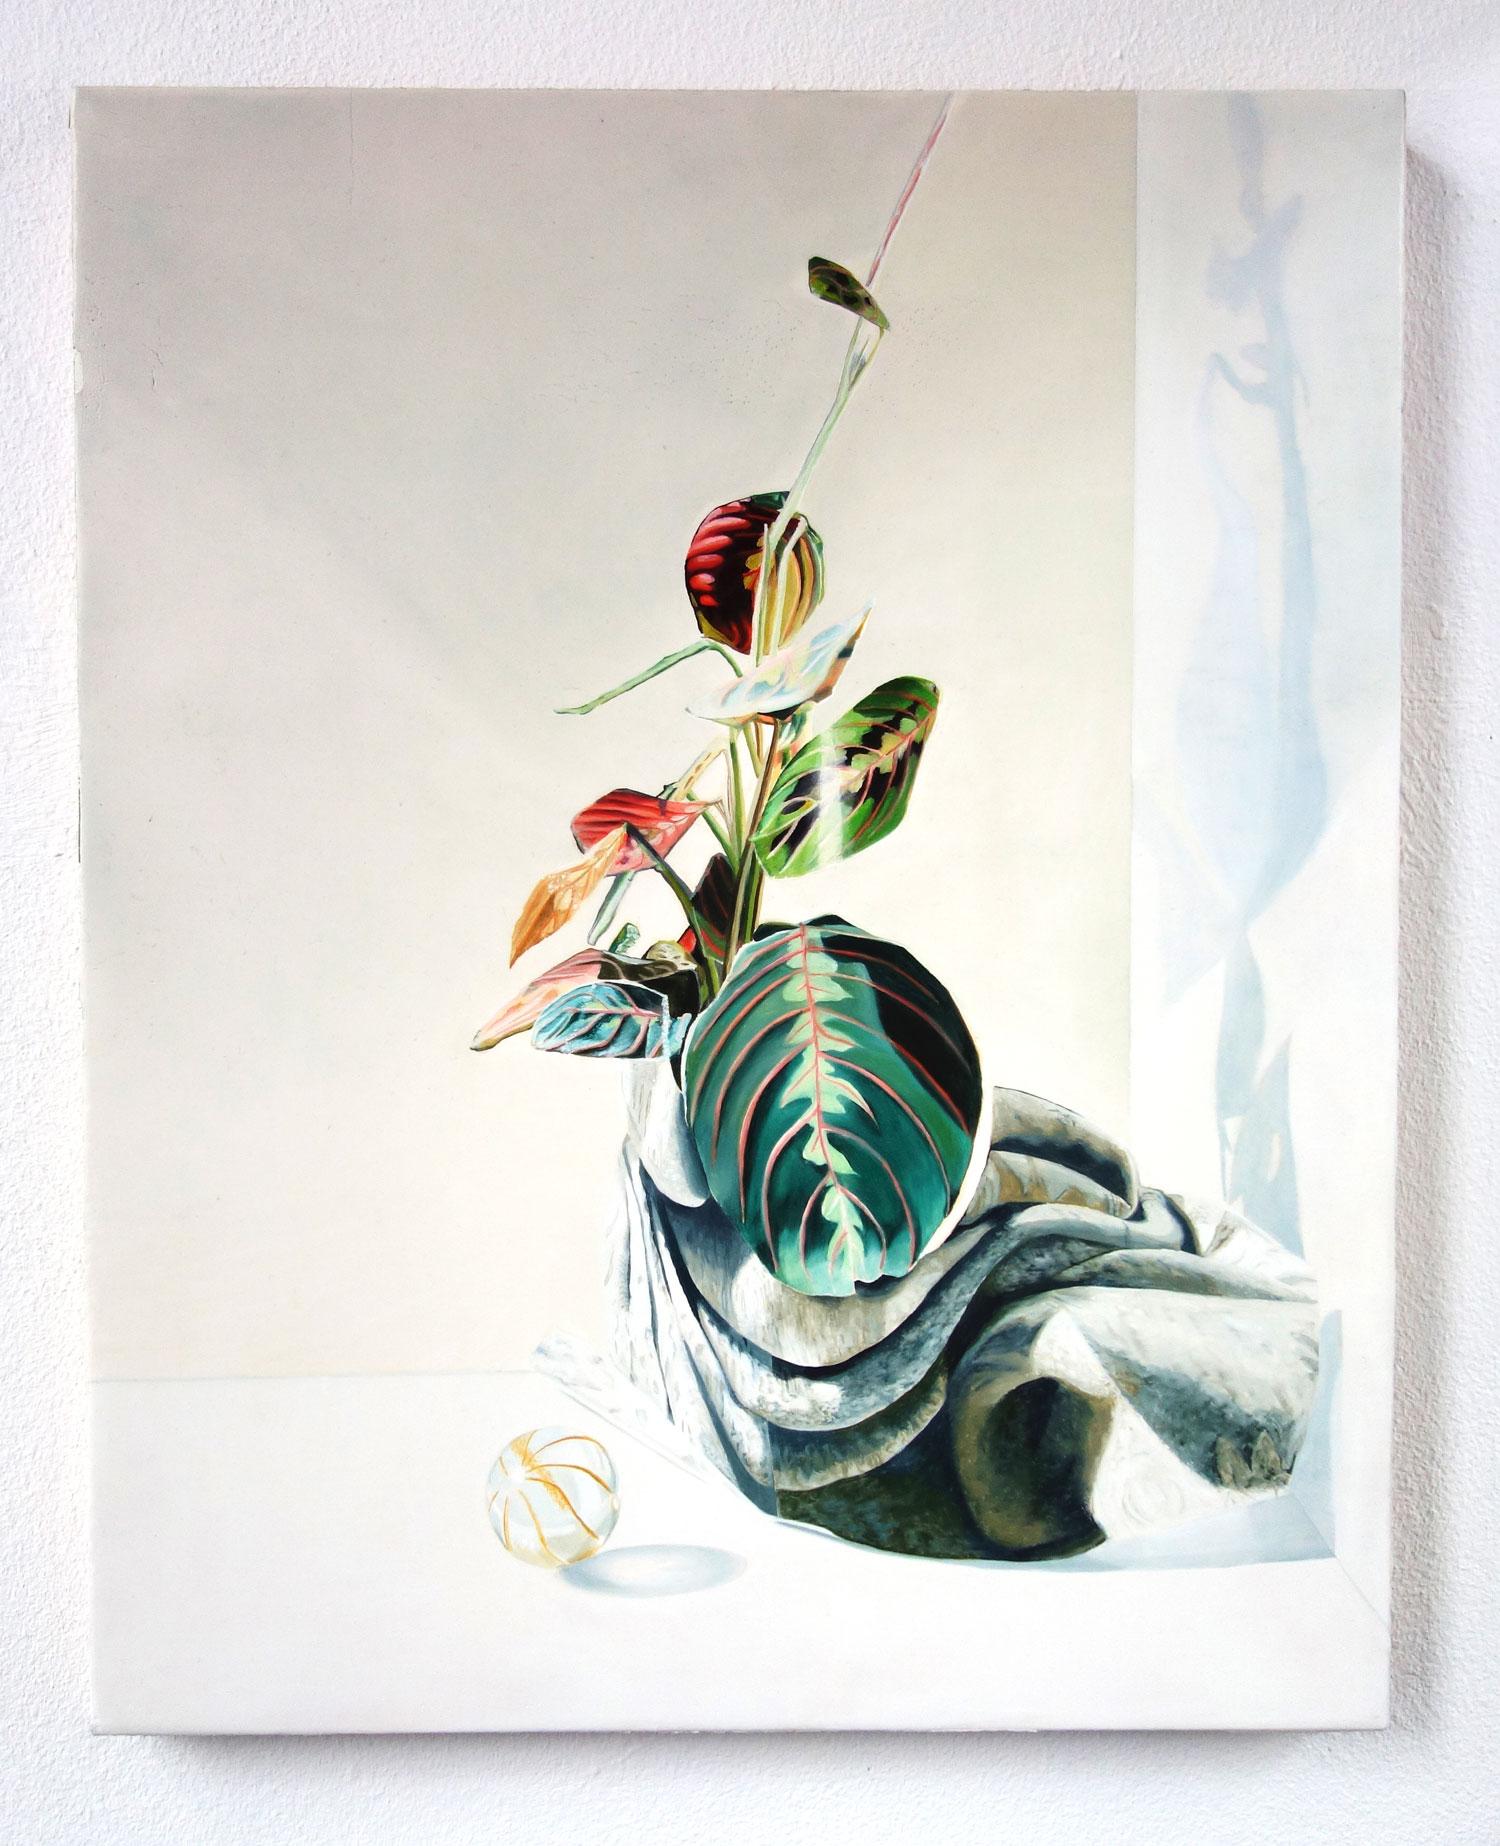 Emilie-Terlinden-work-1